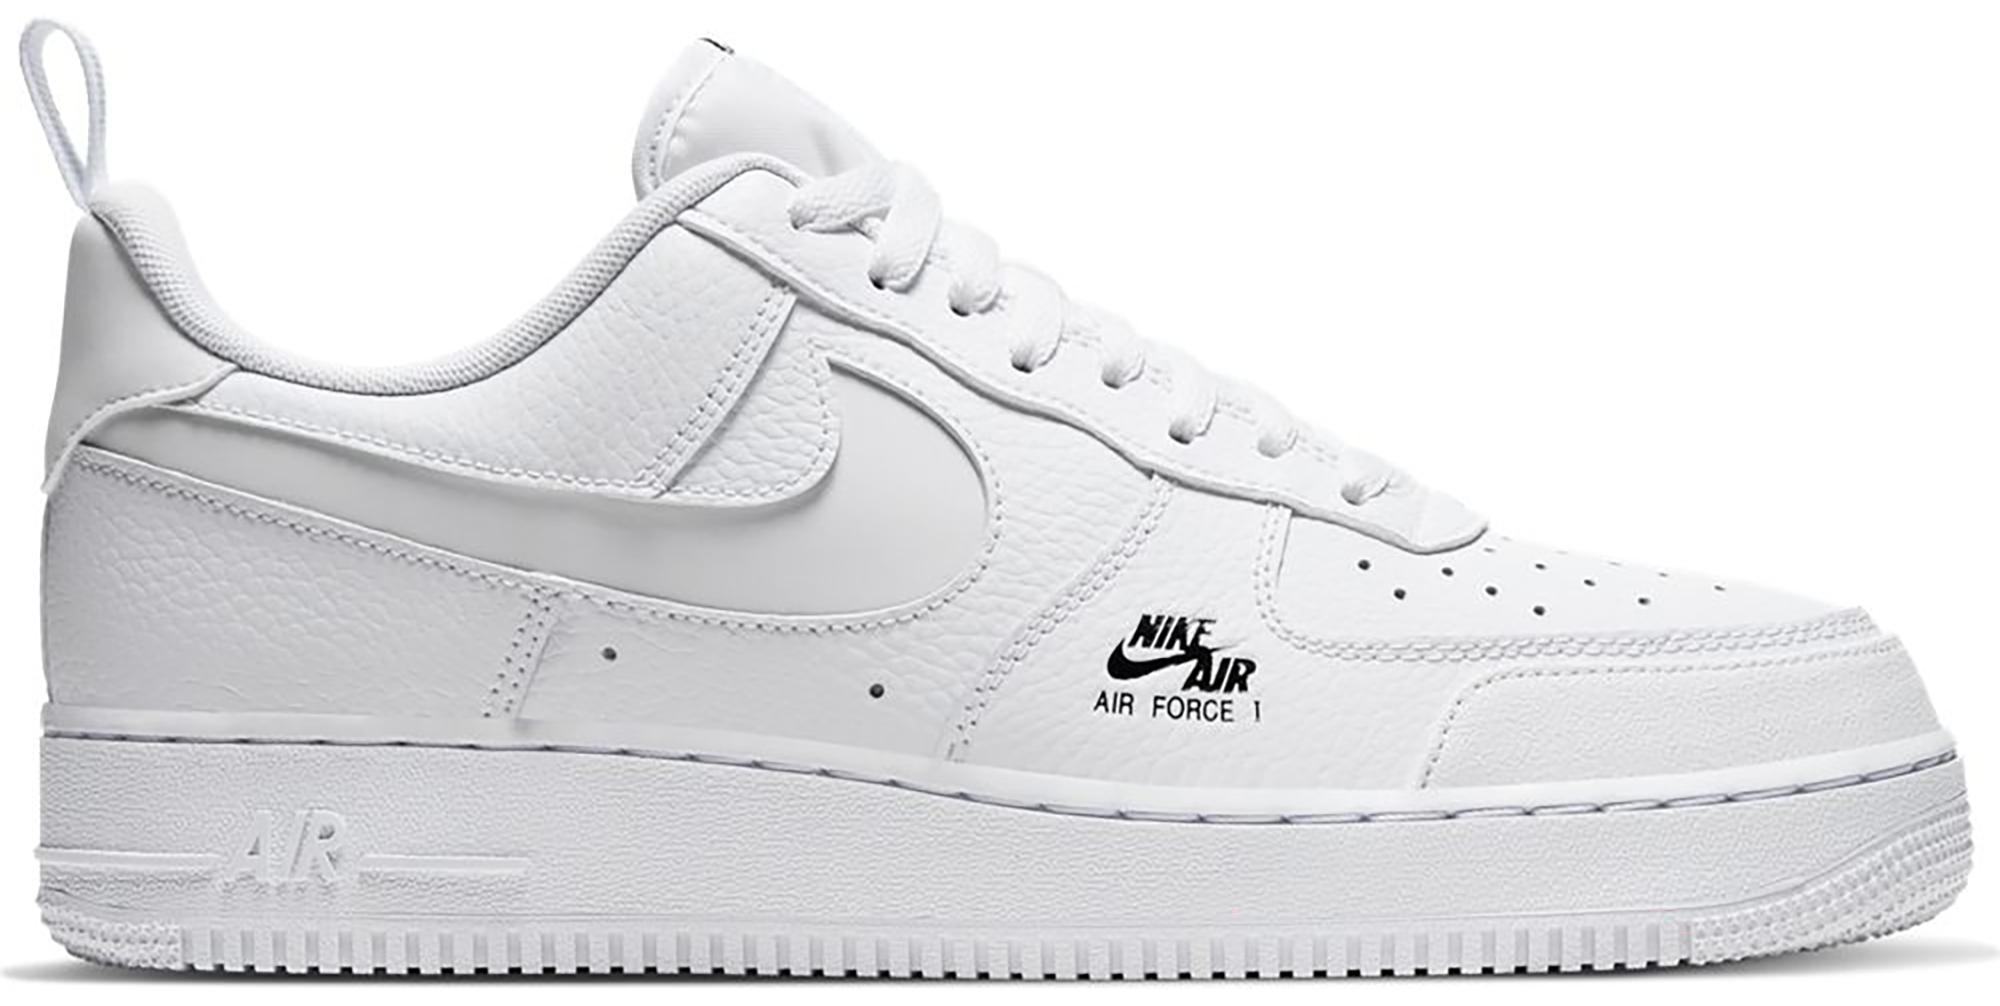 Nike Air Force 1 Utility White (2020